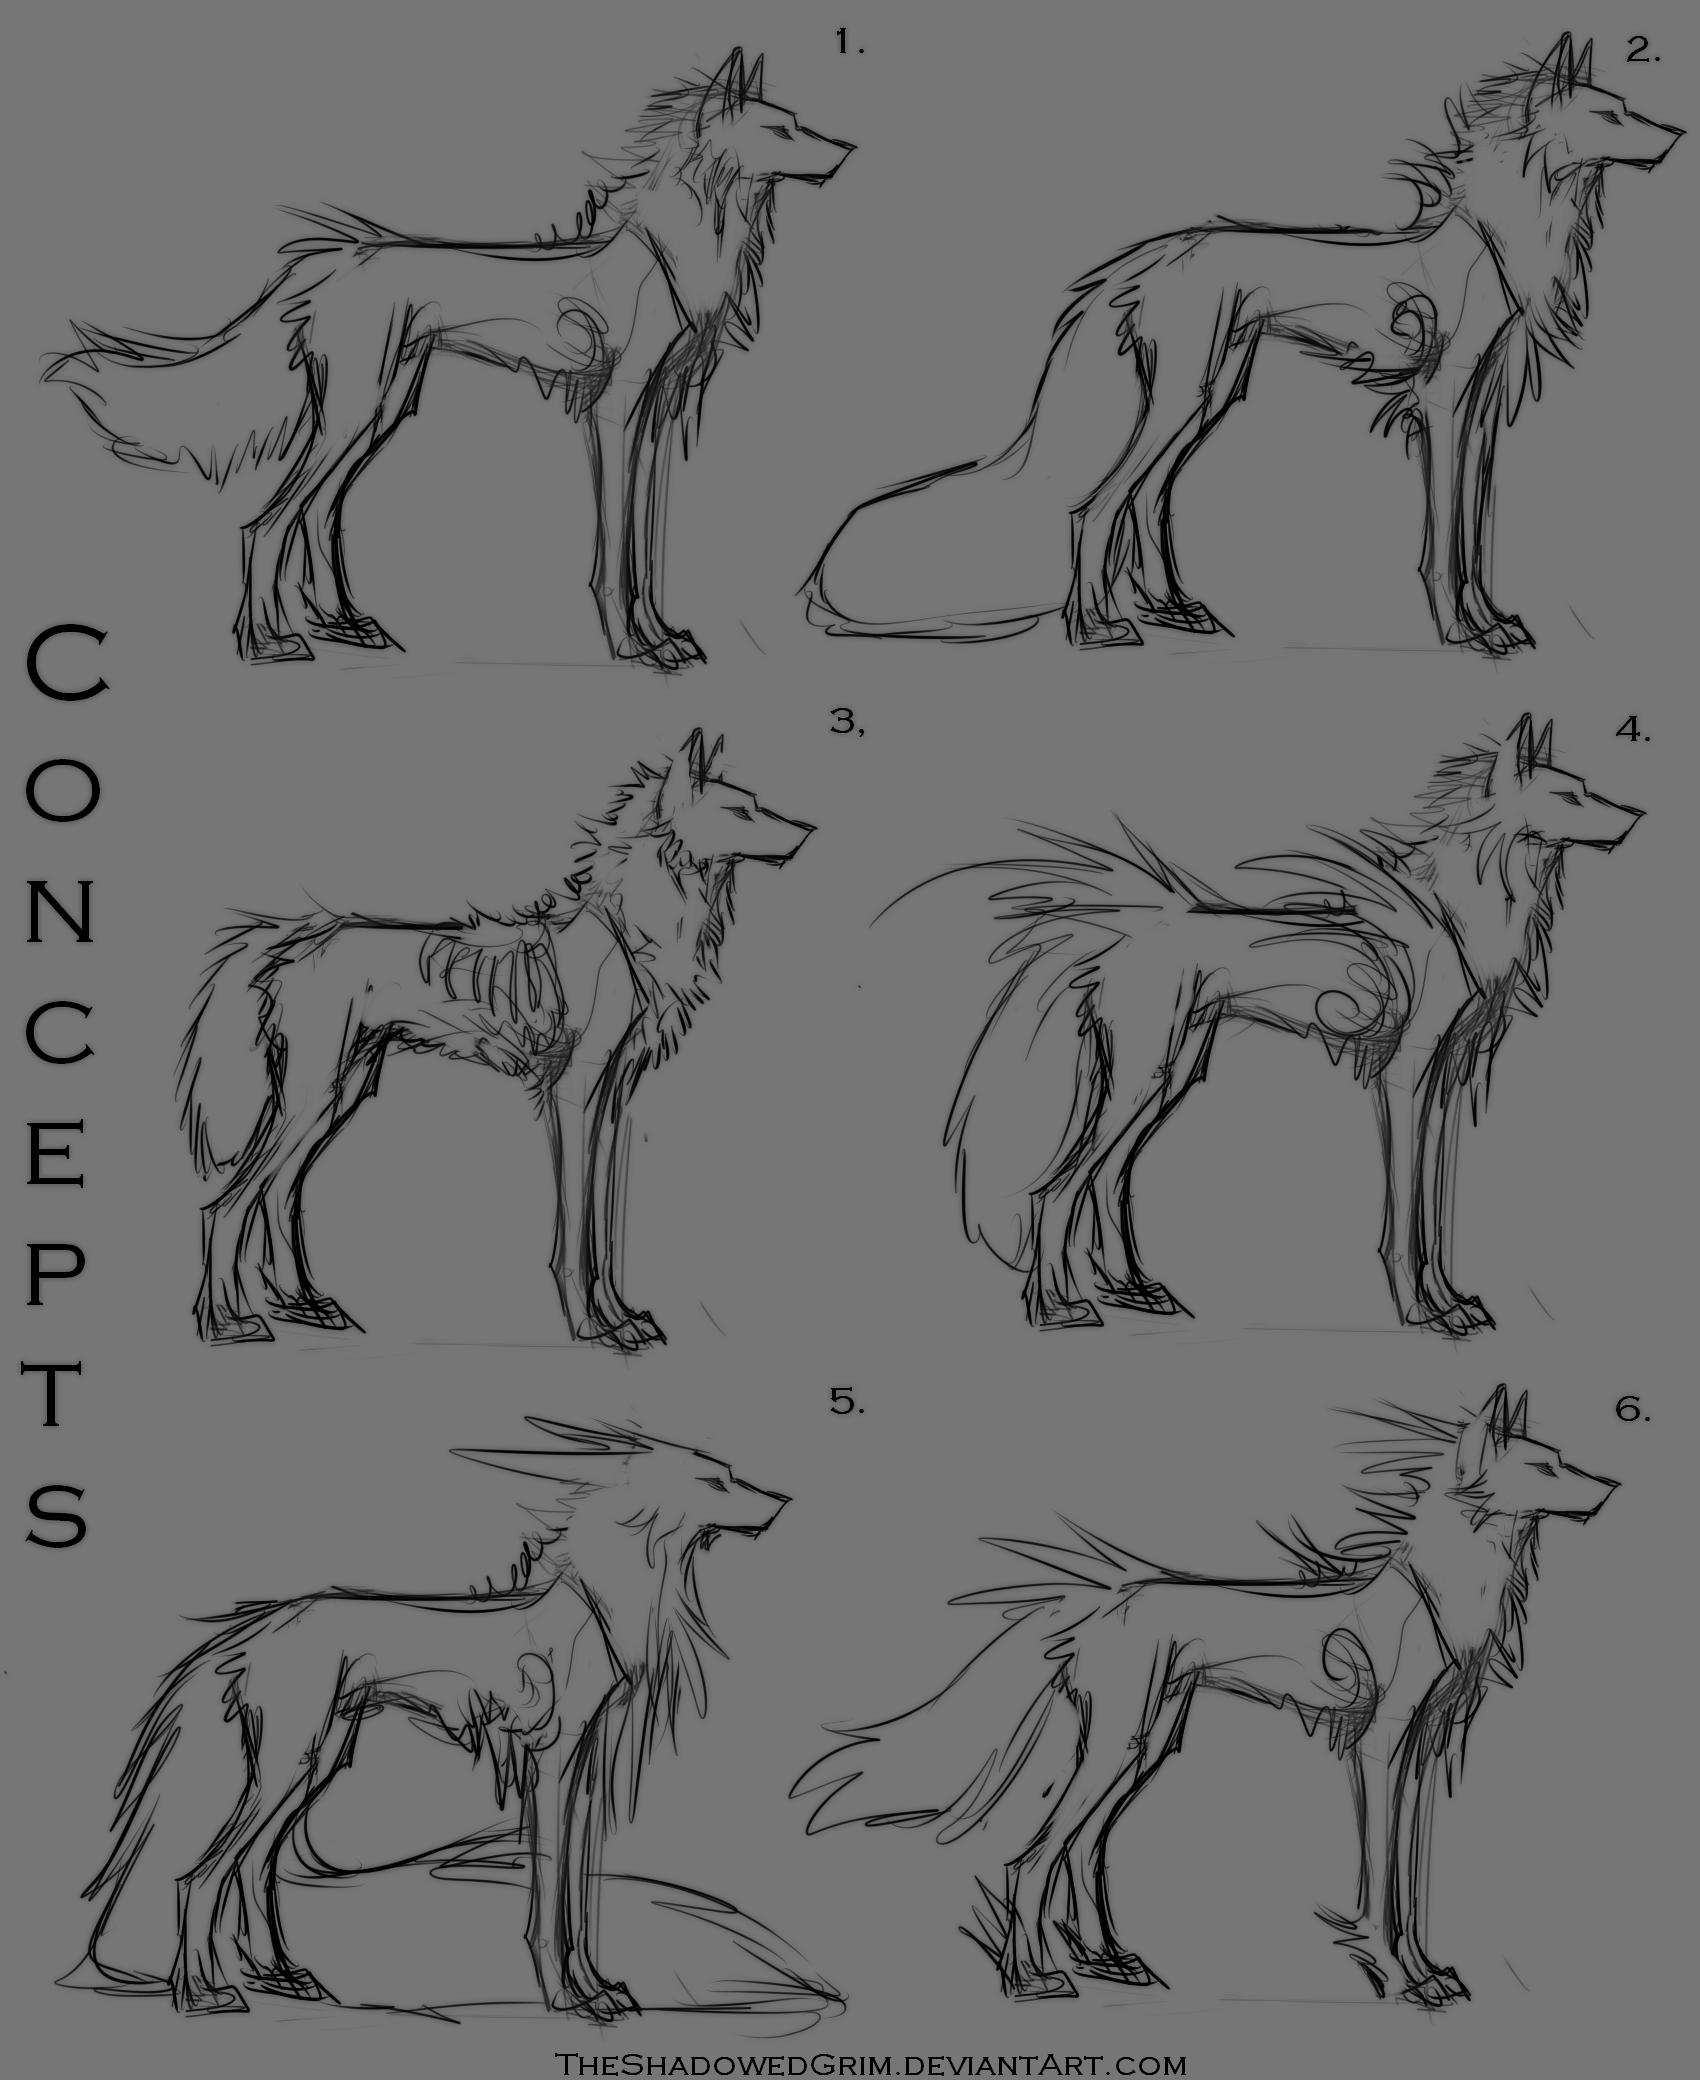 Character Concepts by TheShadowedGrim.deviantart.com on @DeviantArt